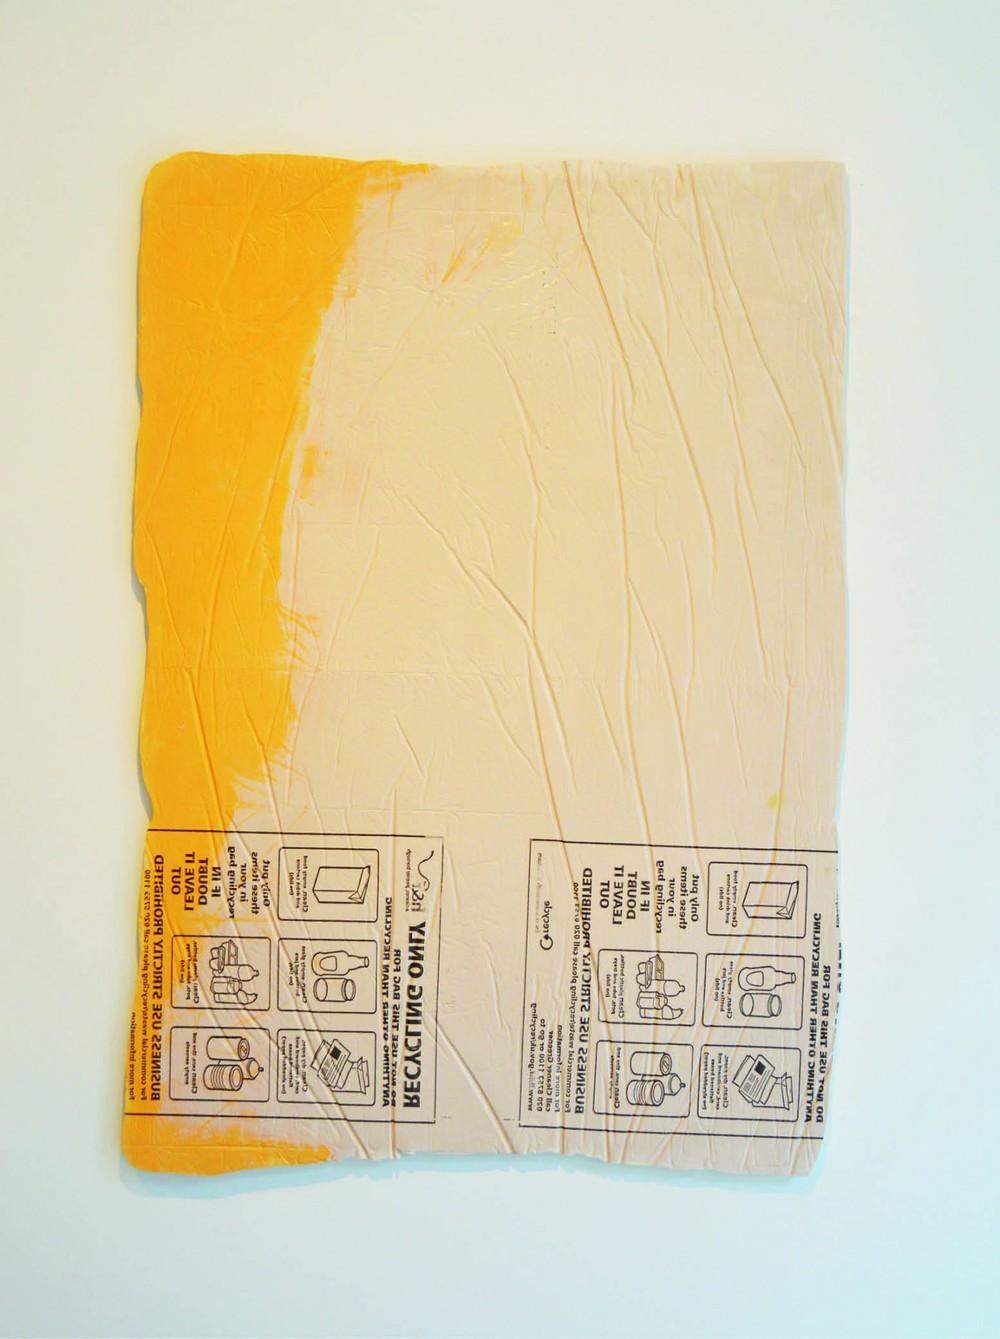 'PE9 Recycled', Composite, Pigment, Acrylic. 116 x 82 cm | 2015